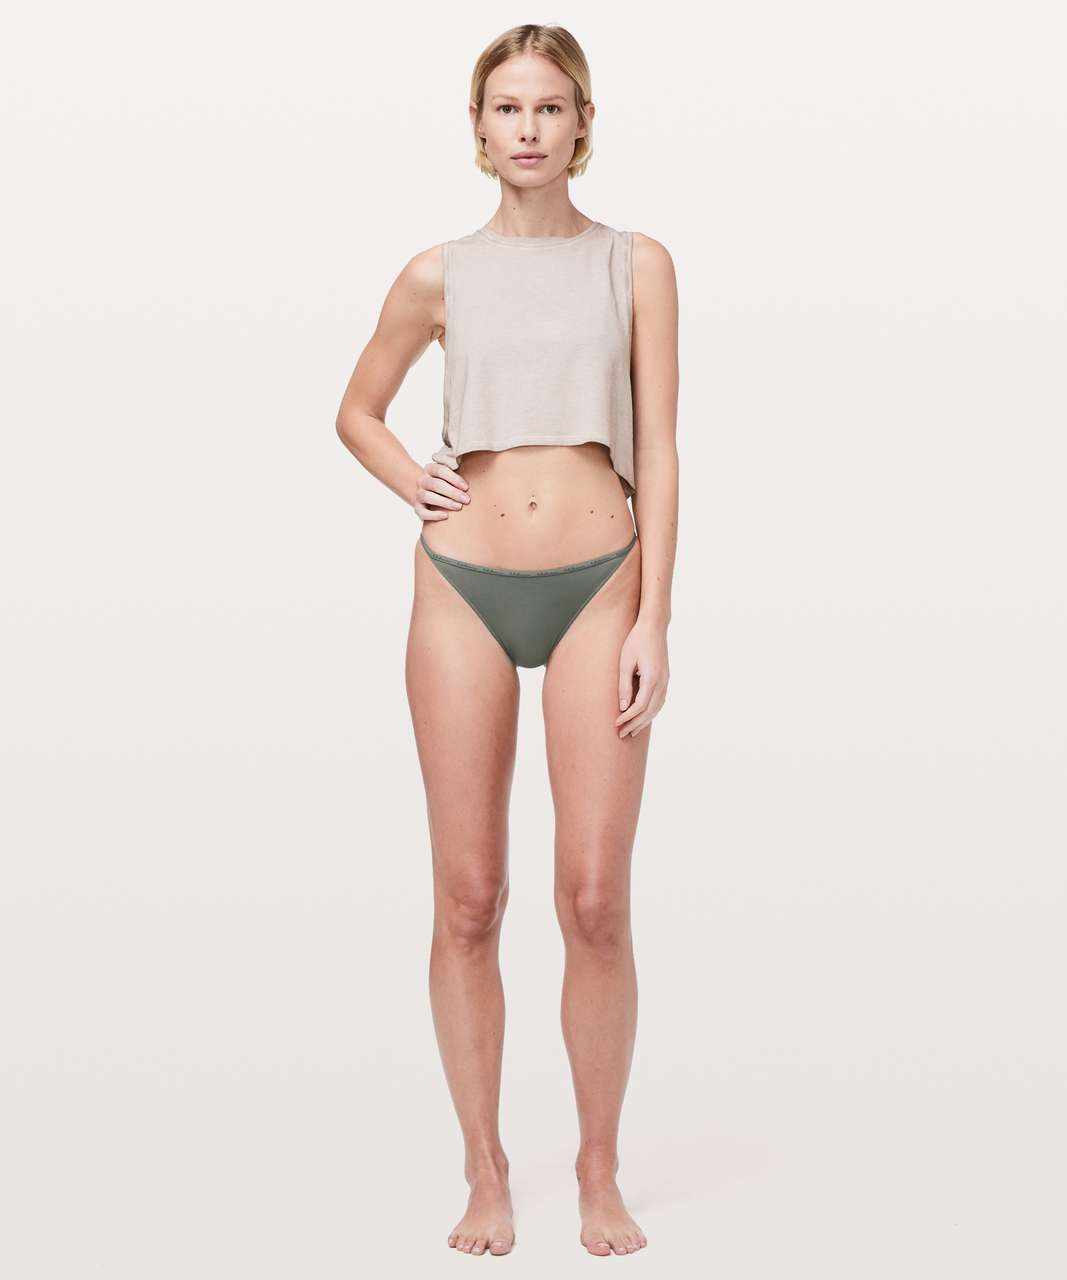 Lululemon Simply There Cheeky Bikini - Grey Sage